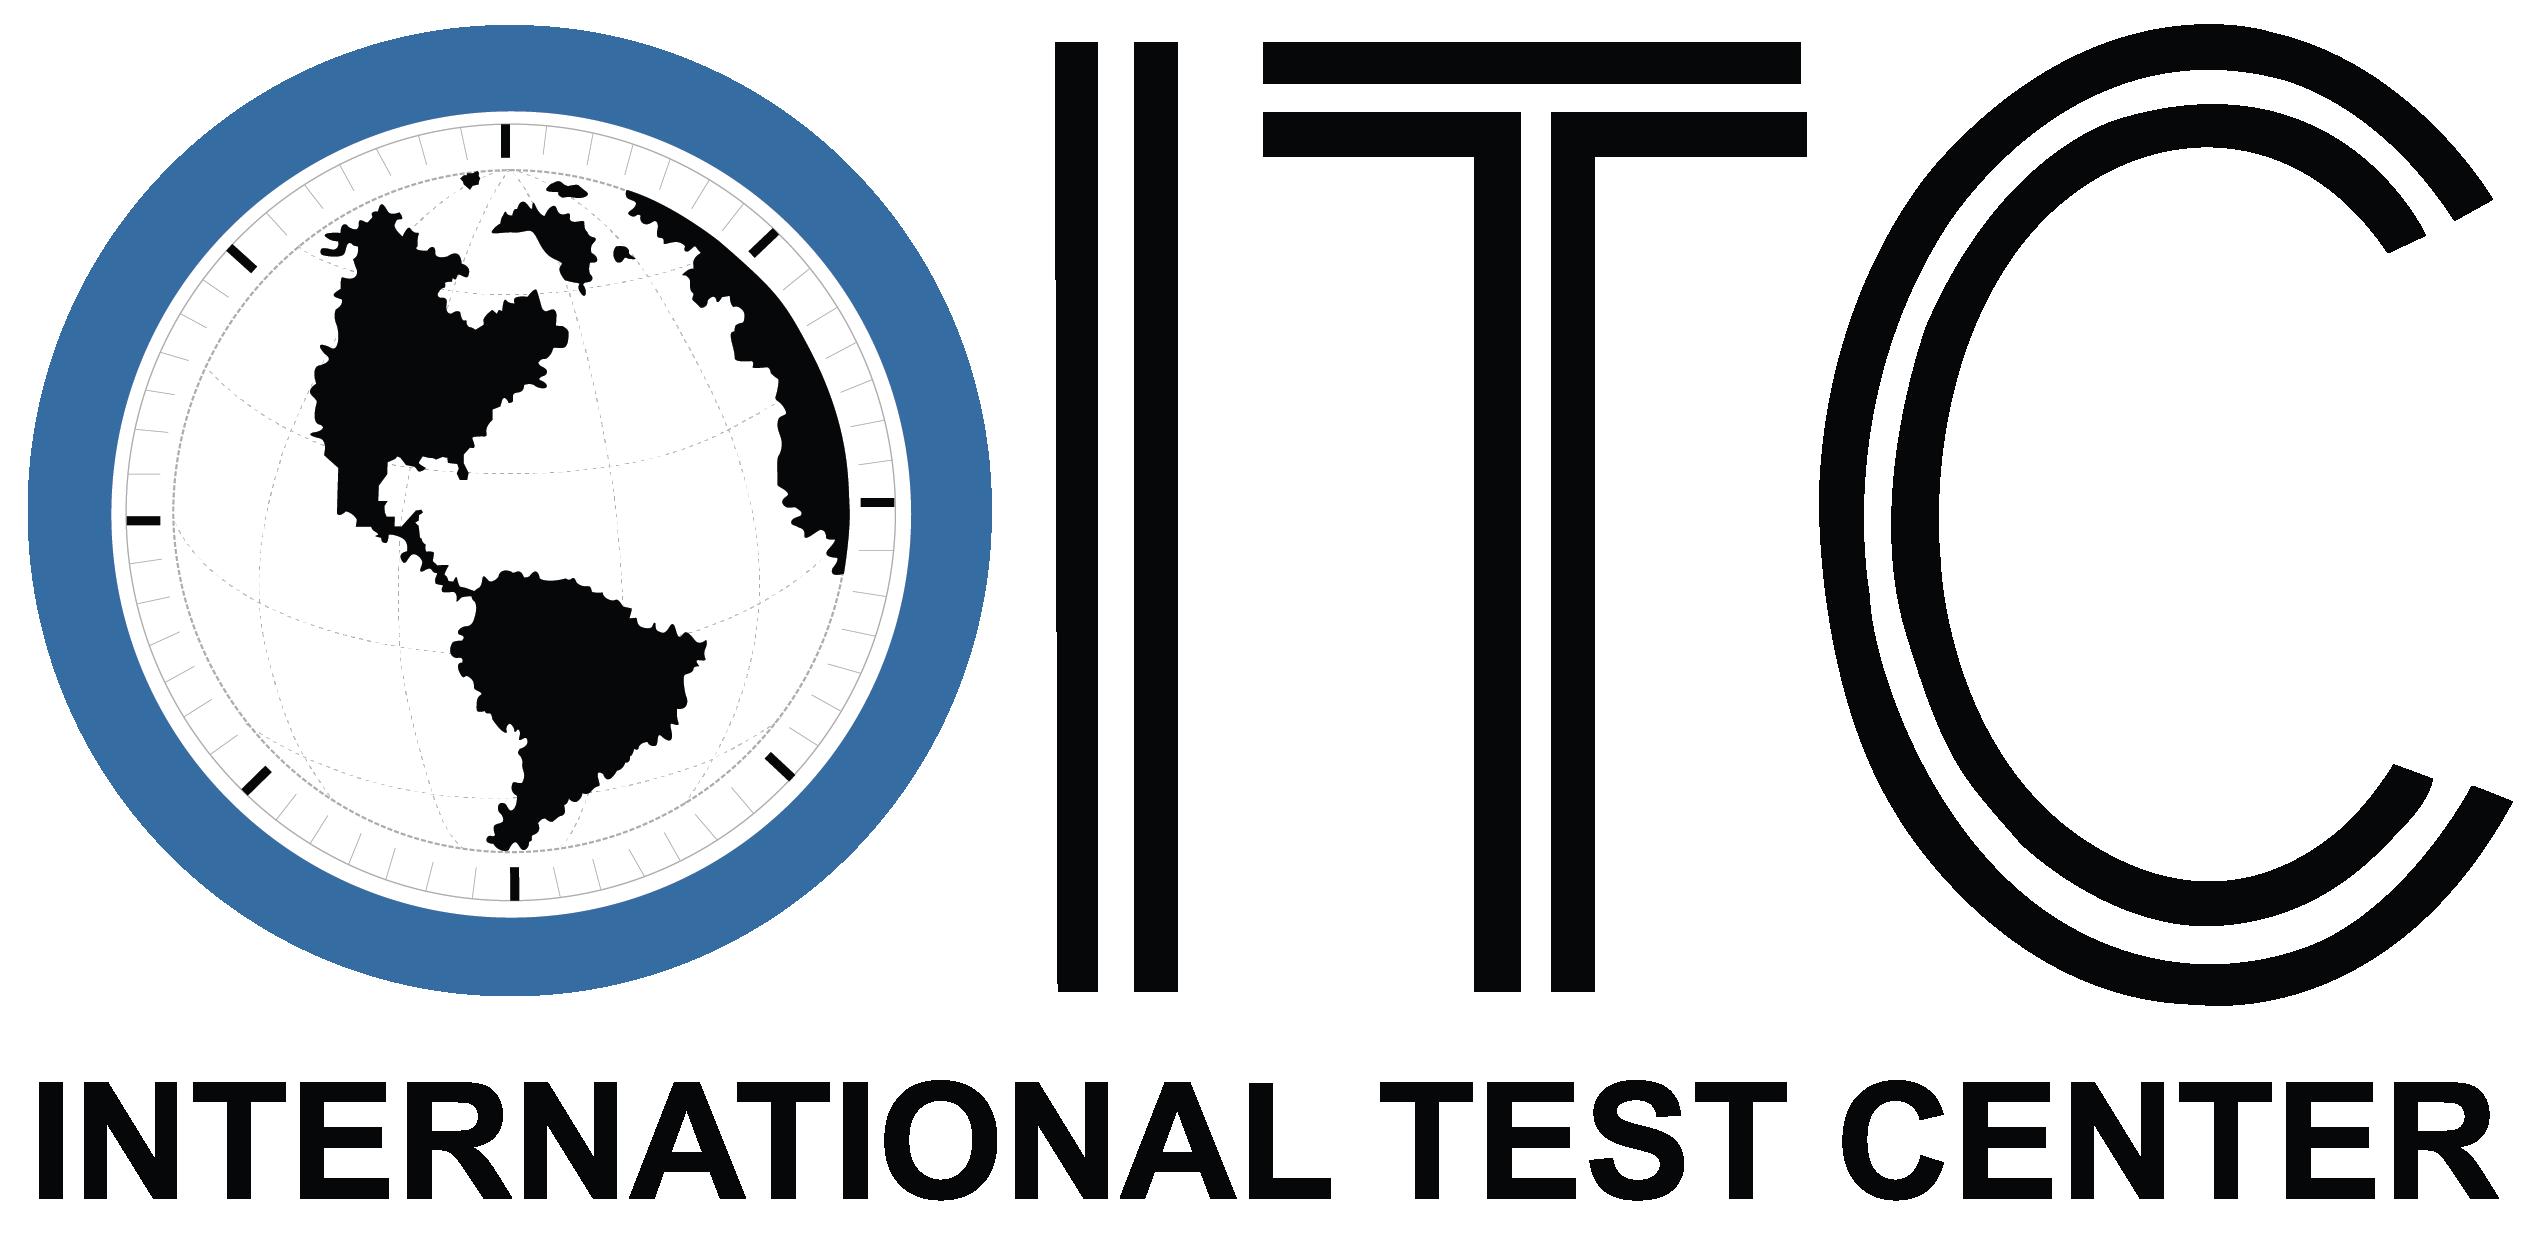 International Test Center